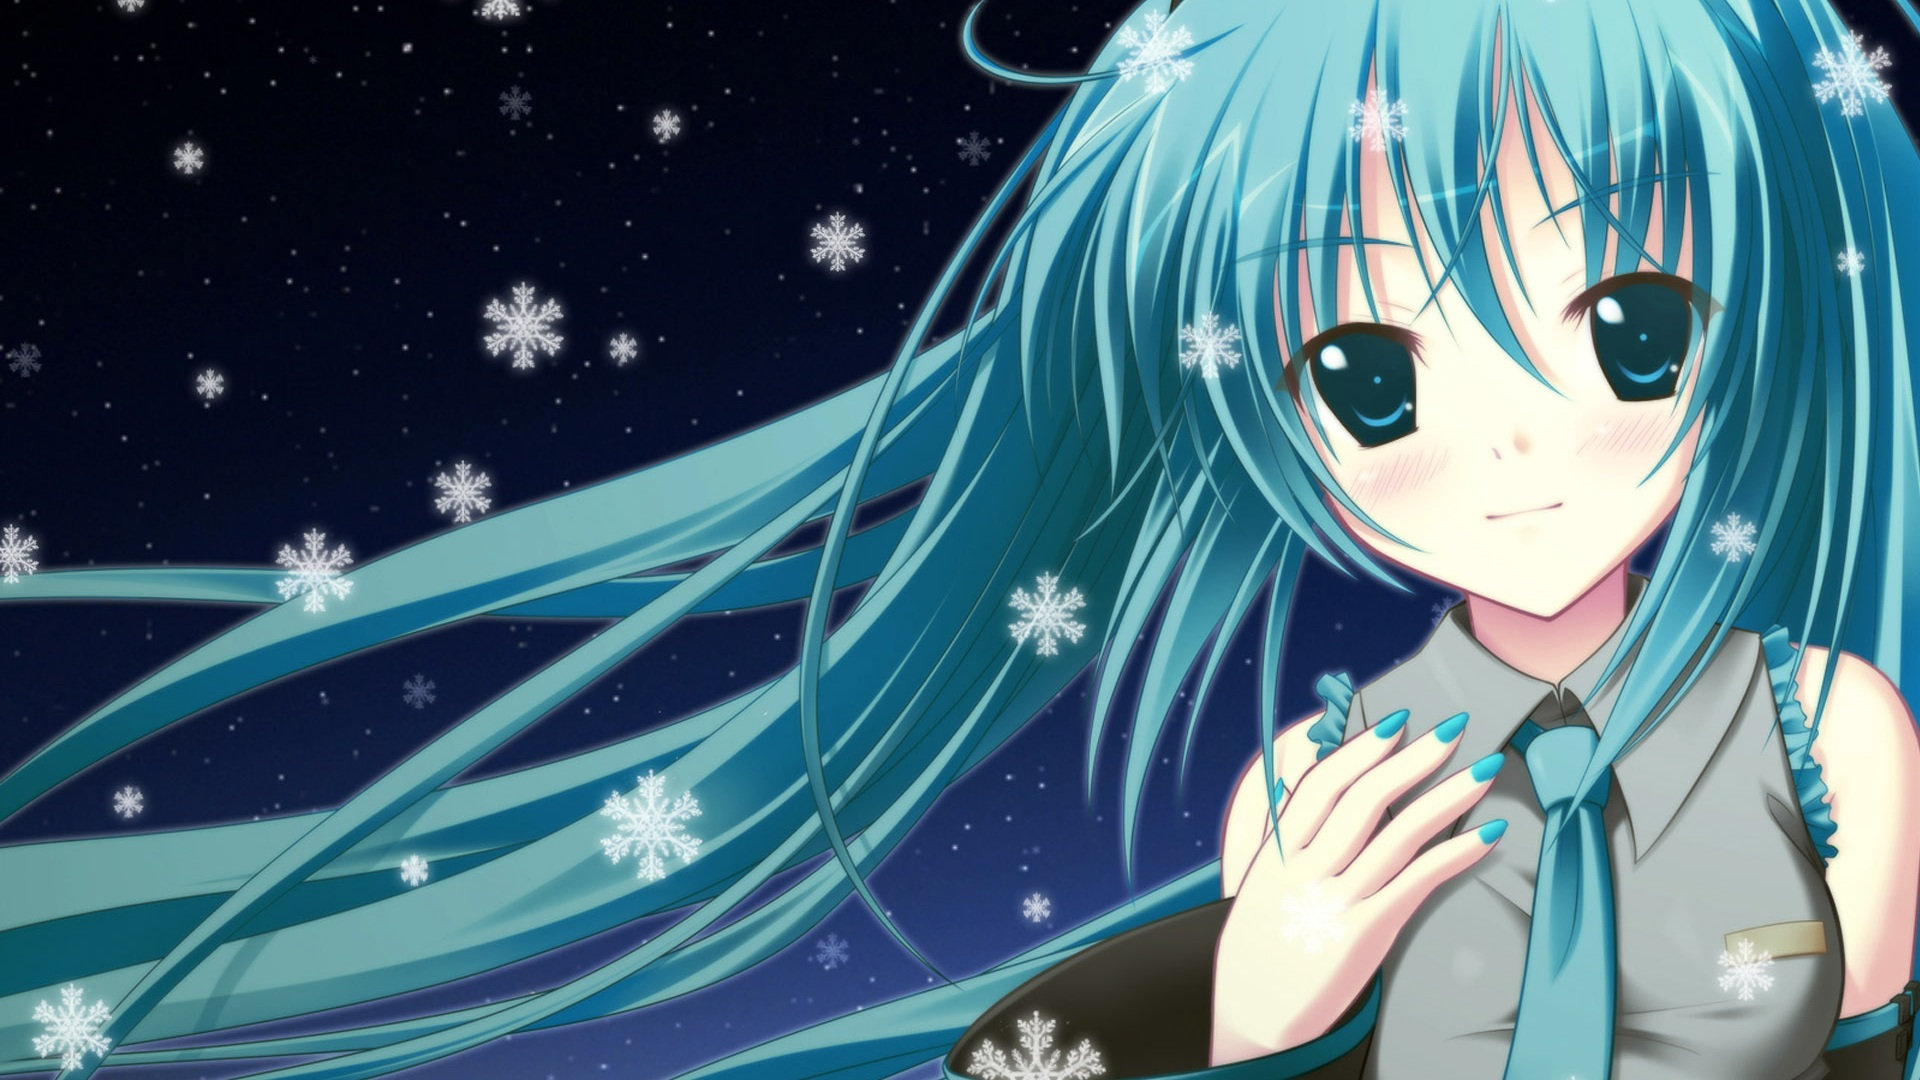 Wallpaper blue hair anime girl 1920x1200 hd picture image - Blue anime wallpaper ...